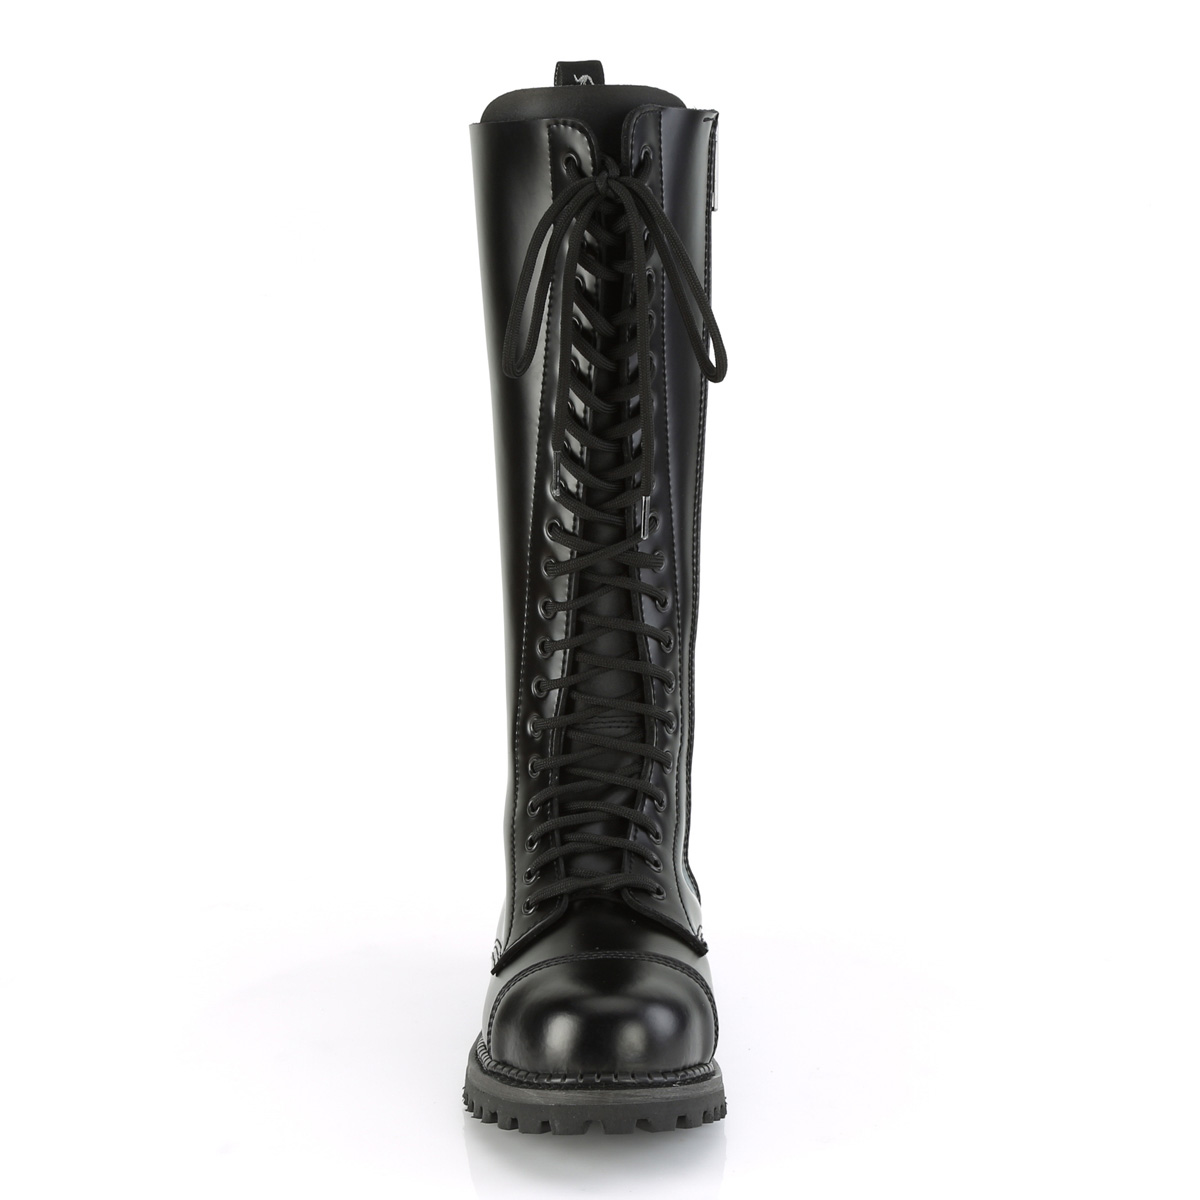 Demonia(デモニア) RIOT-20 スティールトゥ 編み上げブーツ 20アイレット コンバットブーツ 本革黒 #Men's/Unisex◆取り寄せ